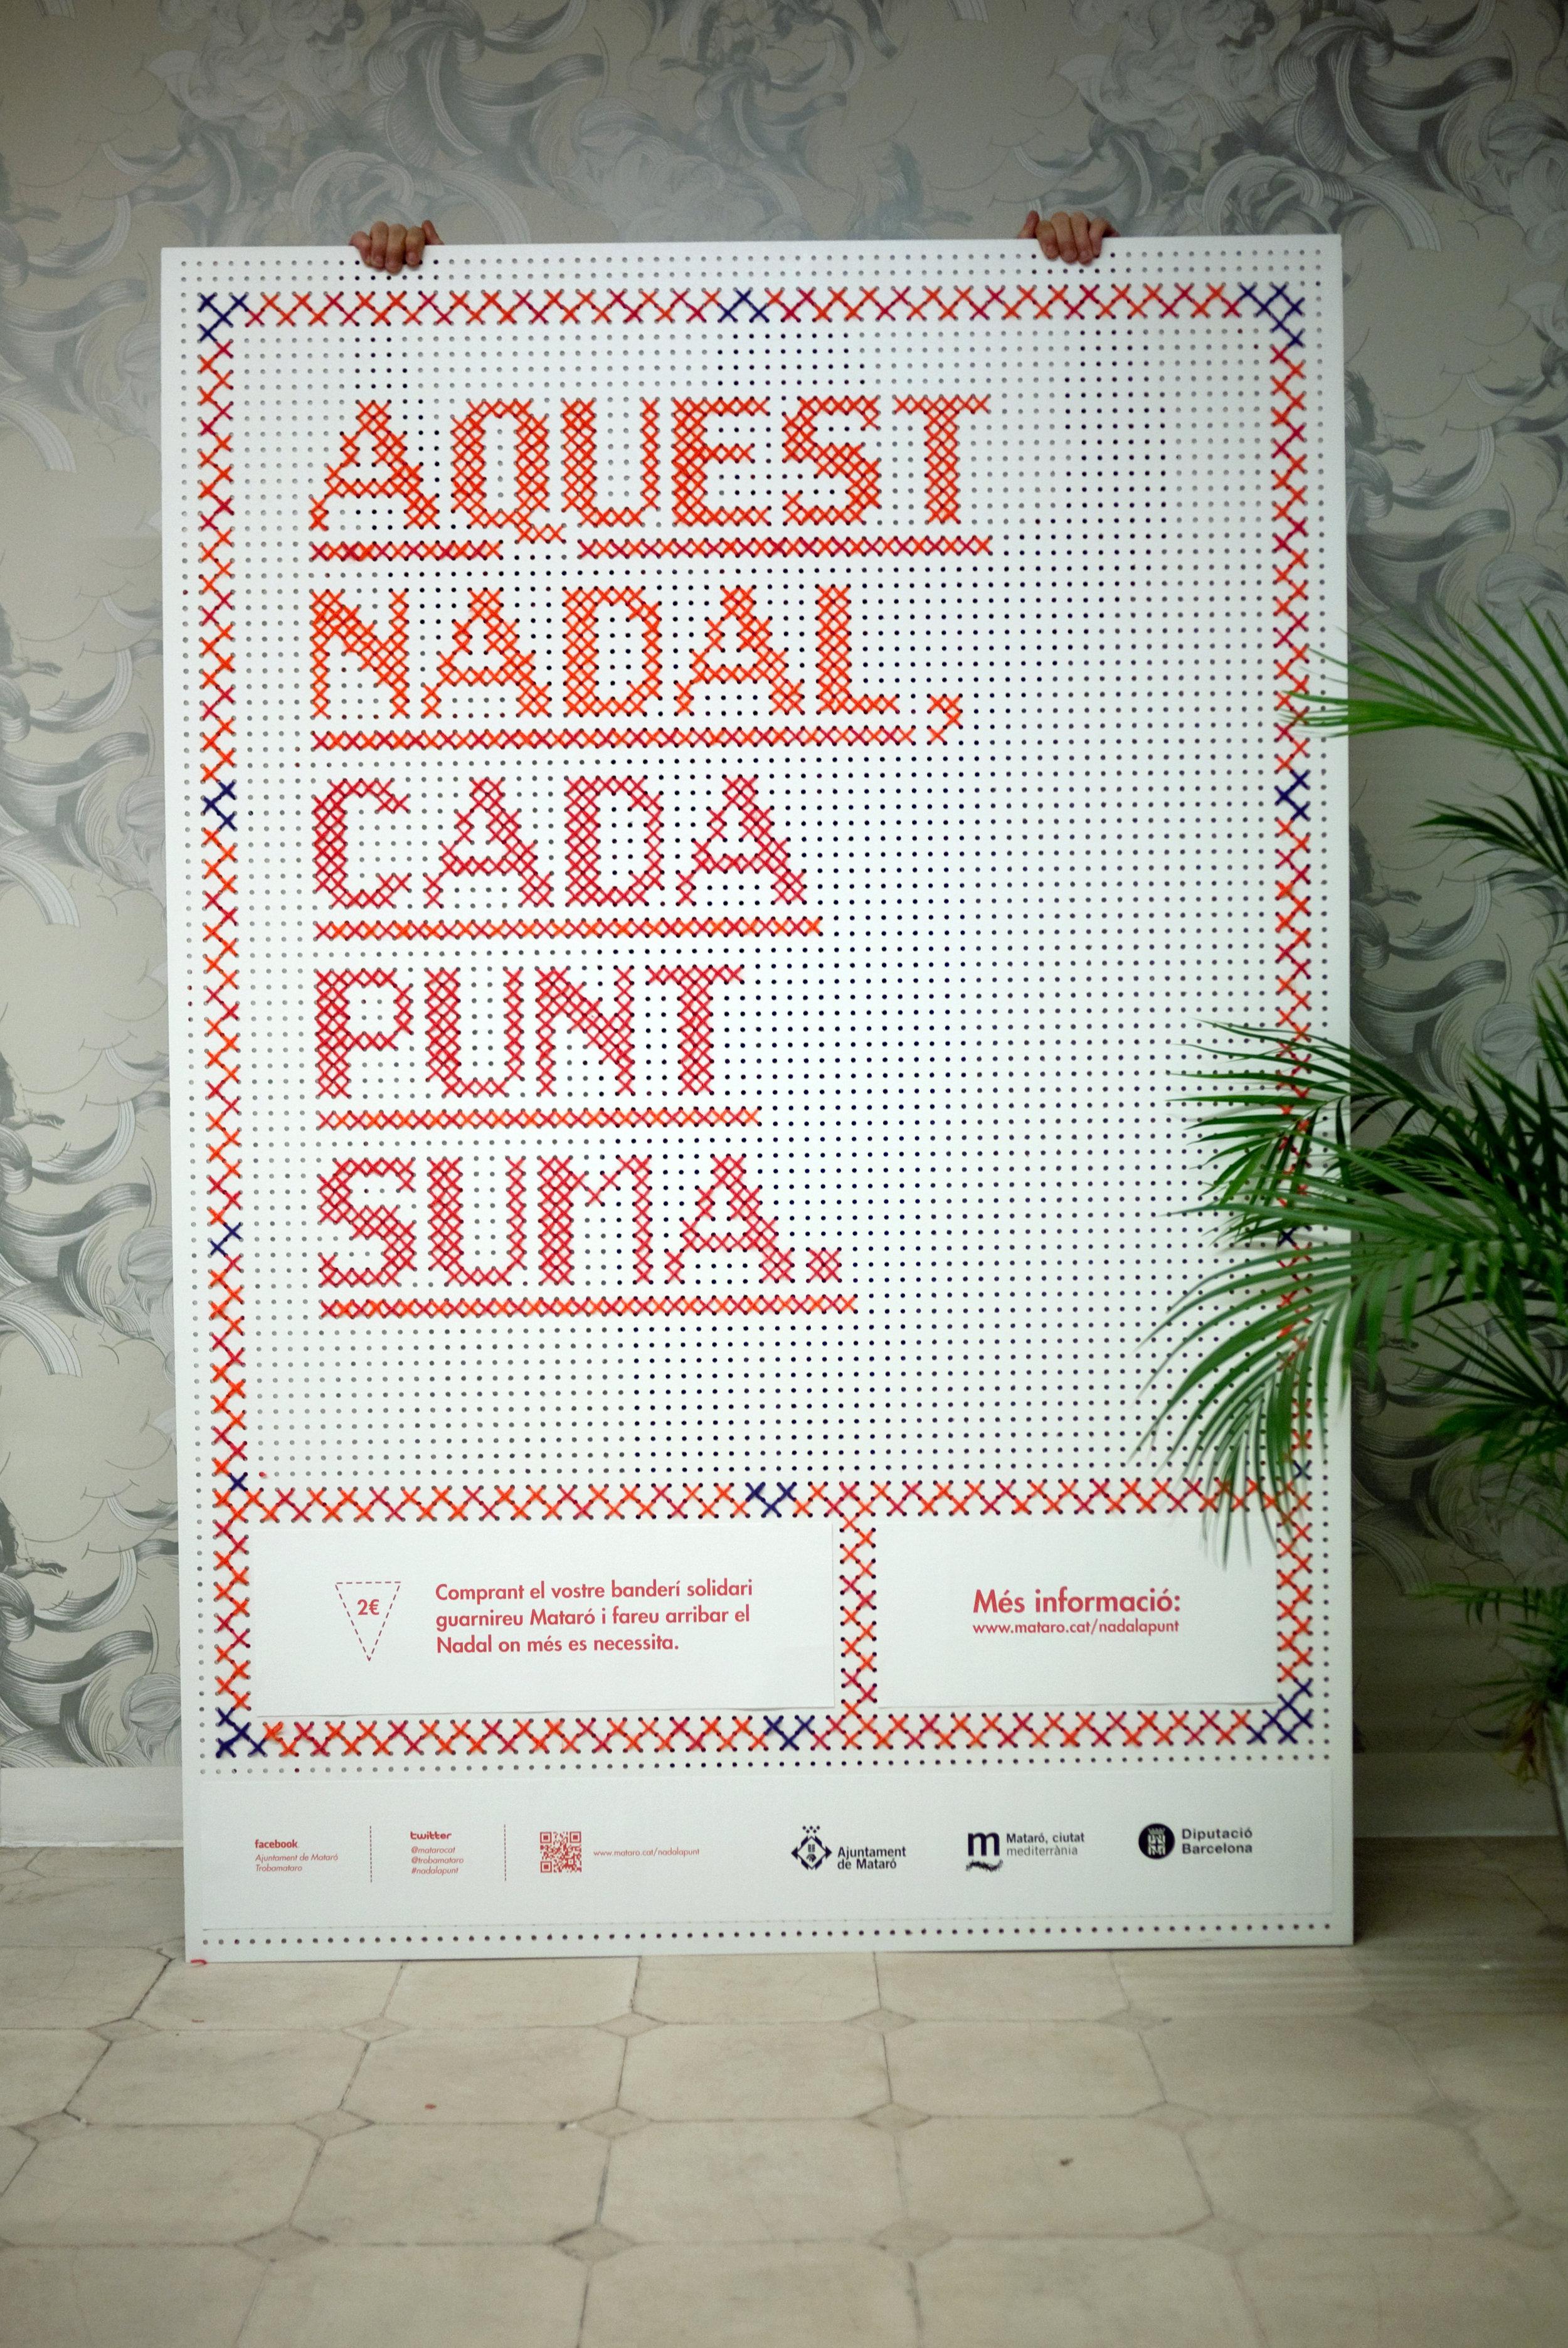 Campaña Navidad Ajuntament de Mataró para Evil Love con Núria Brunet.